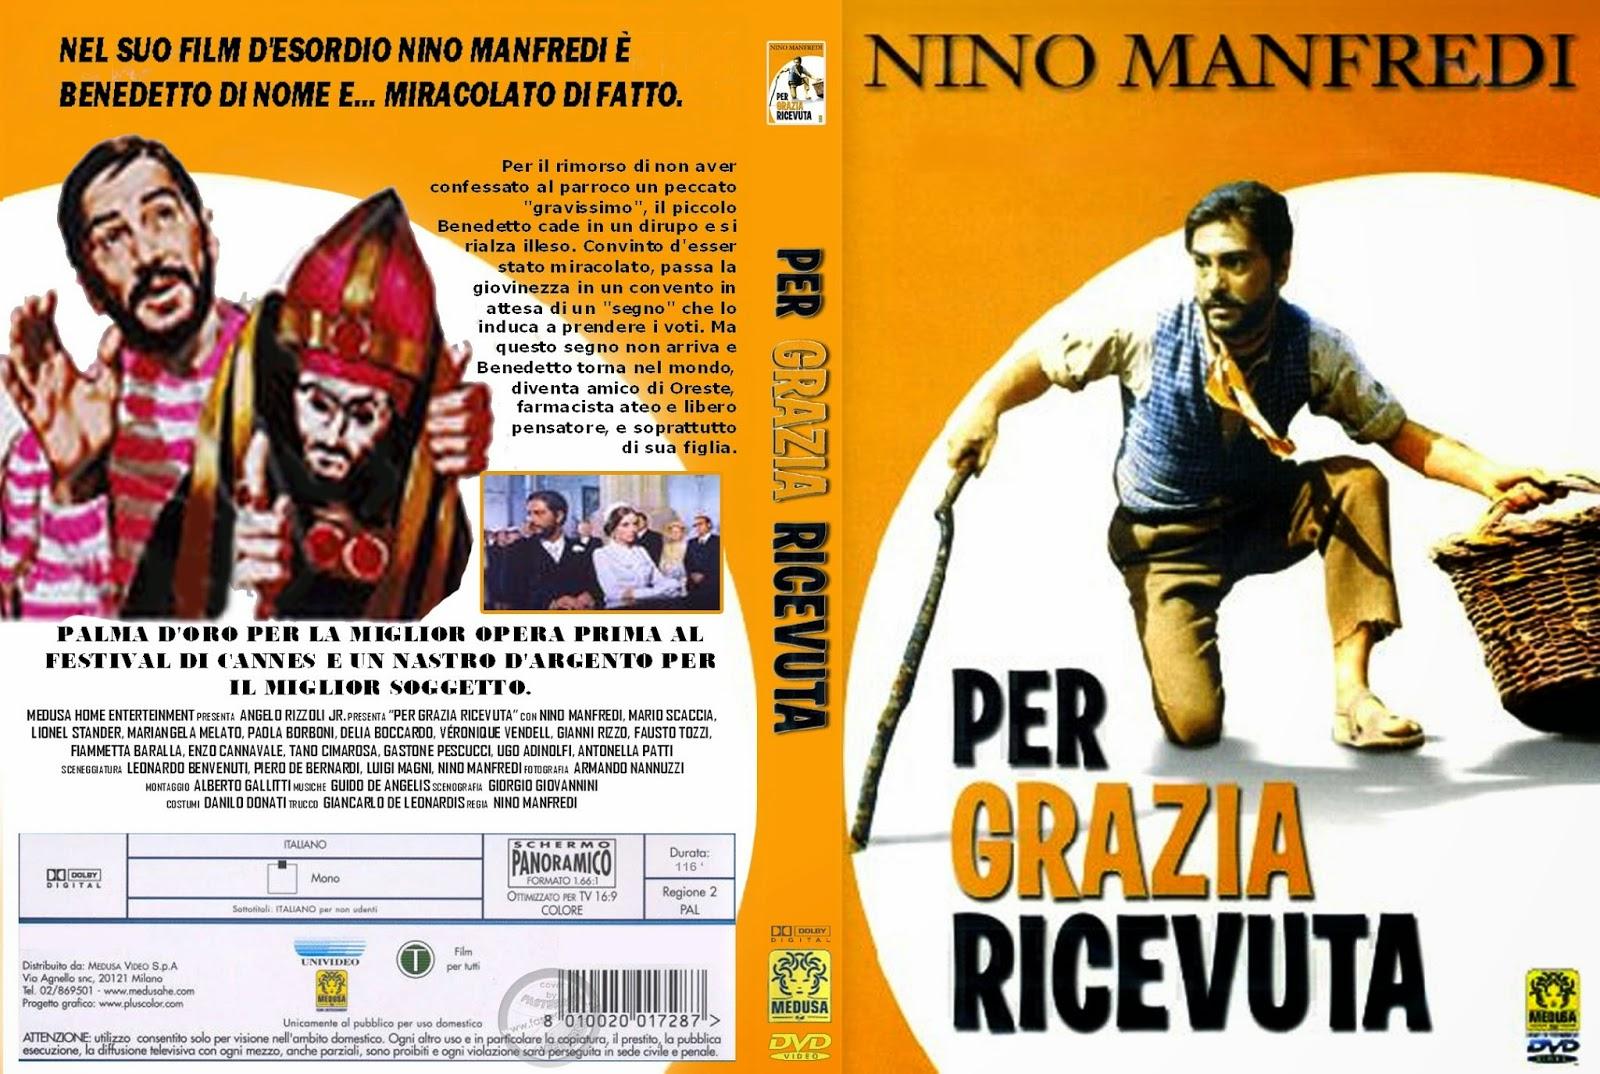 За полученную милость / Per grazia ricevuta / Between Miracles. 1971.